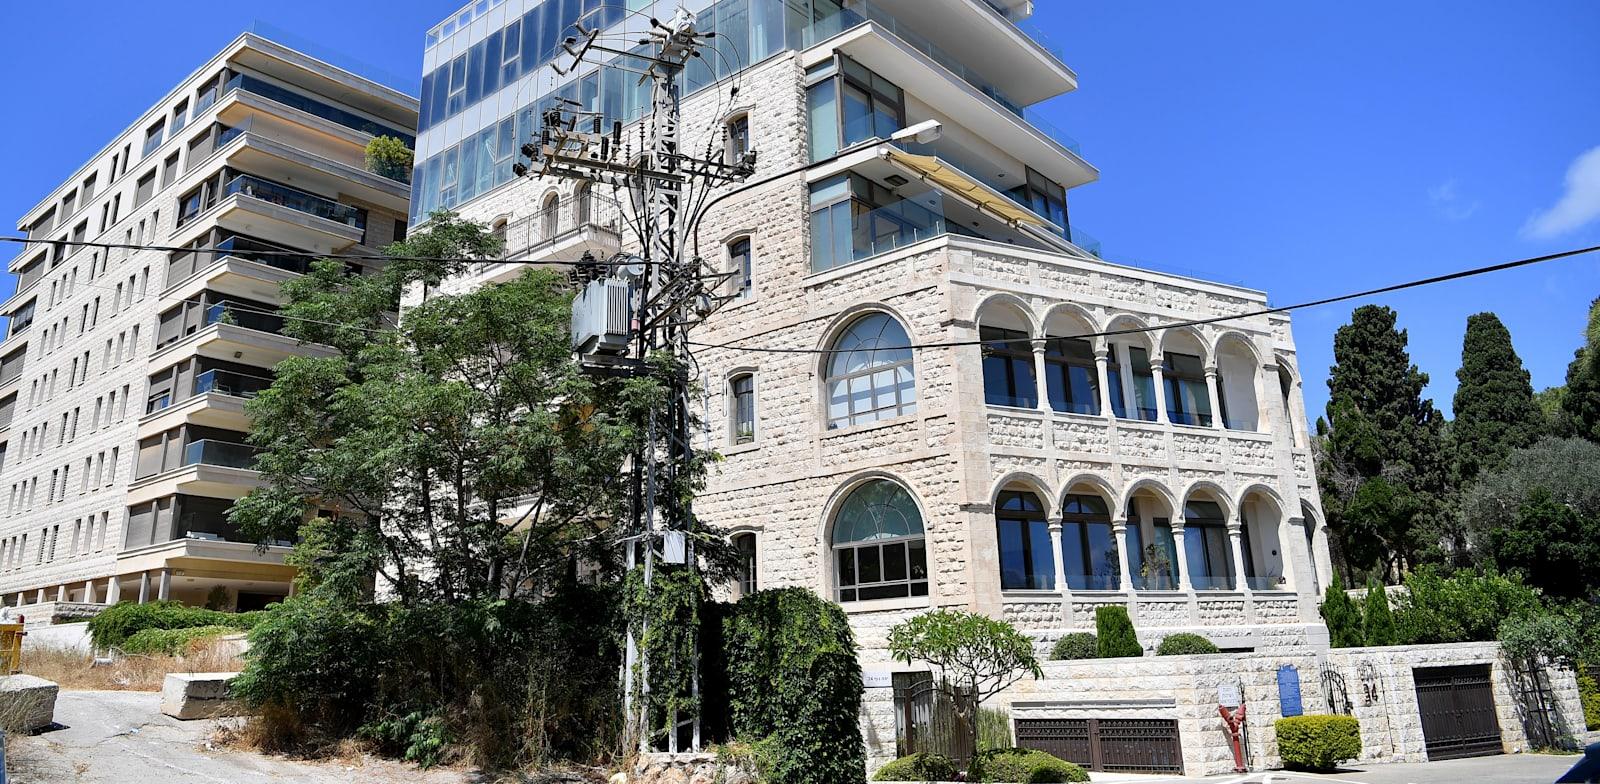 Yefe Nof, Haifa Photo: Paul Orlive